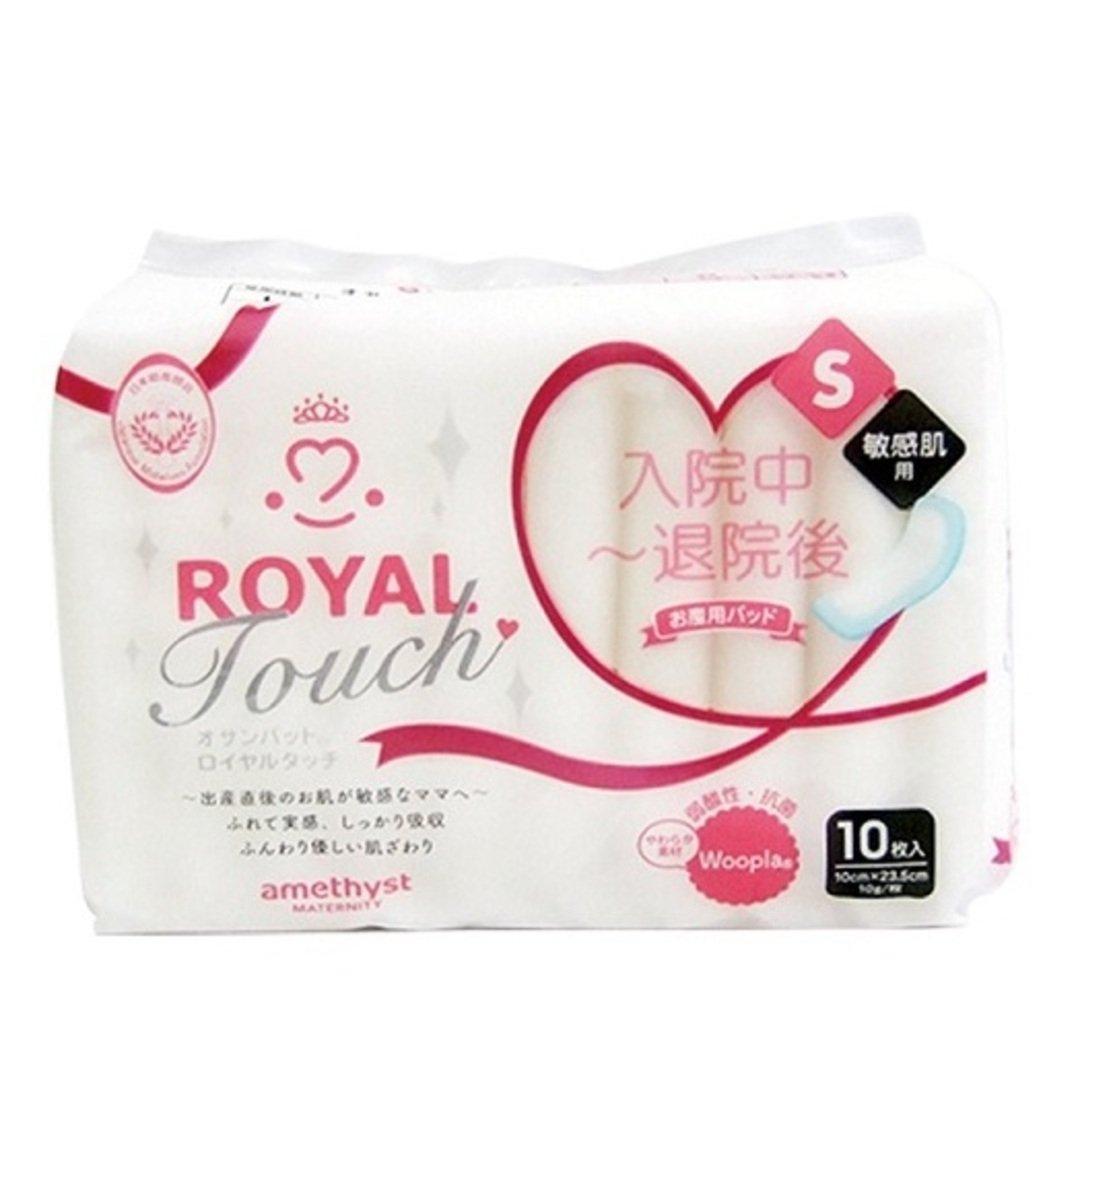 Royal Touch敏感肌適用產後專用衛生巾 S碼 (10片/包)